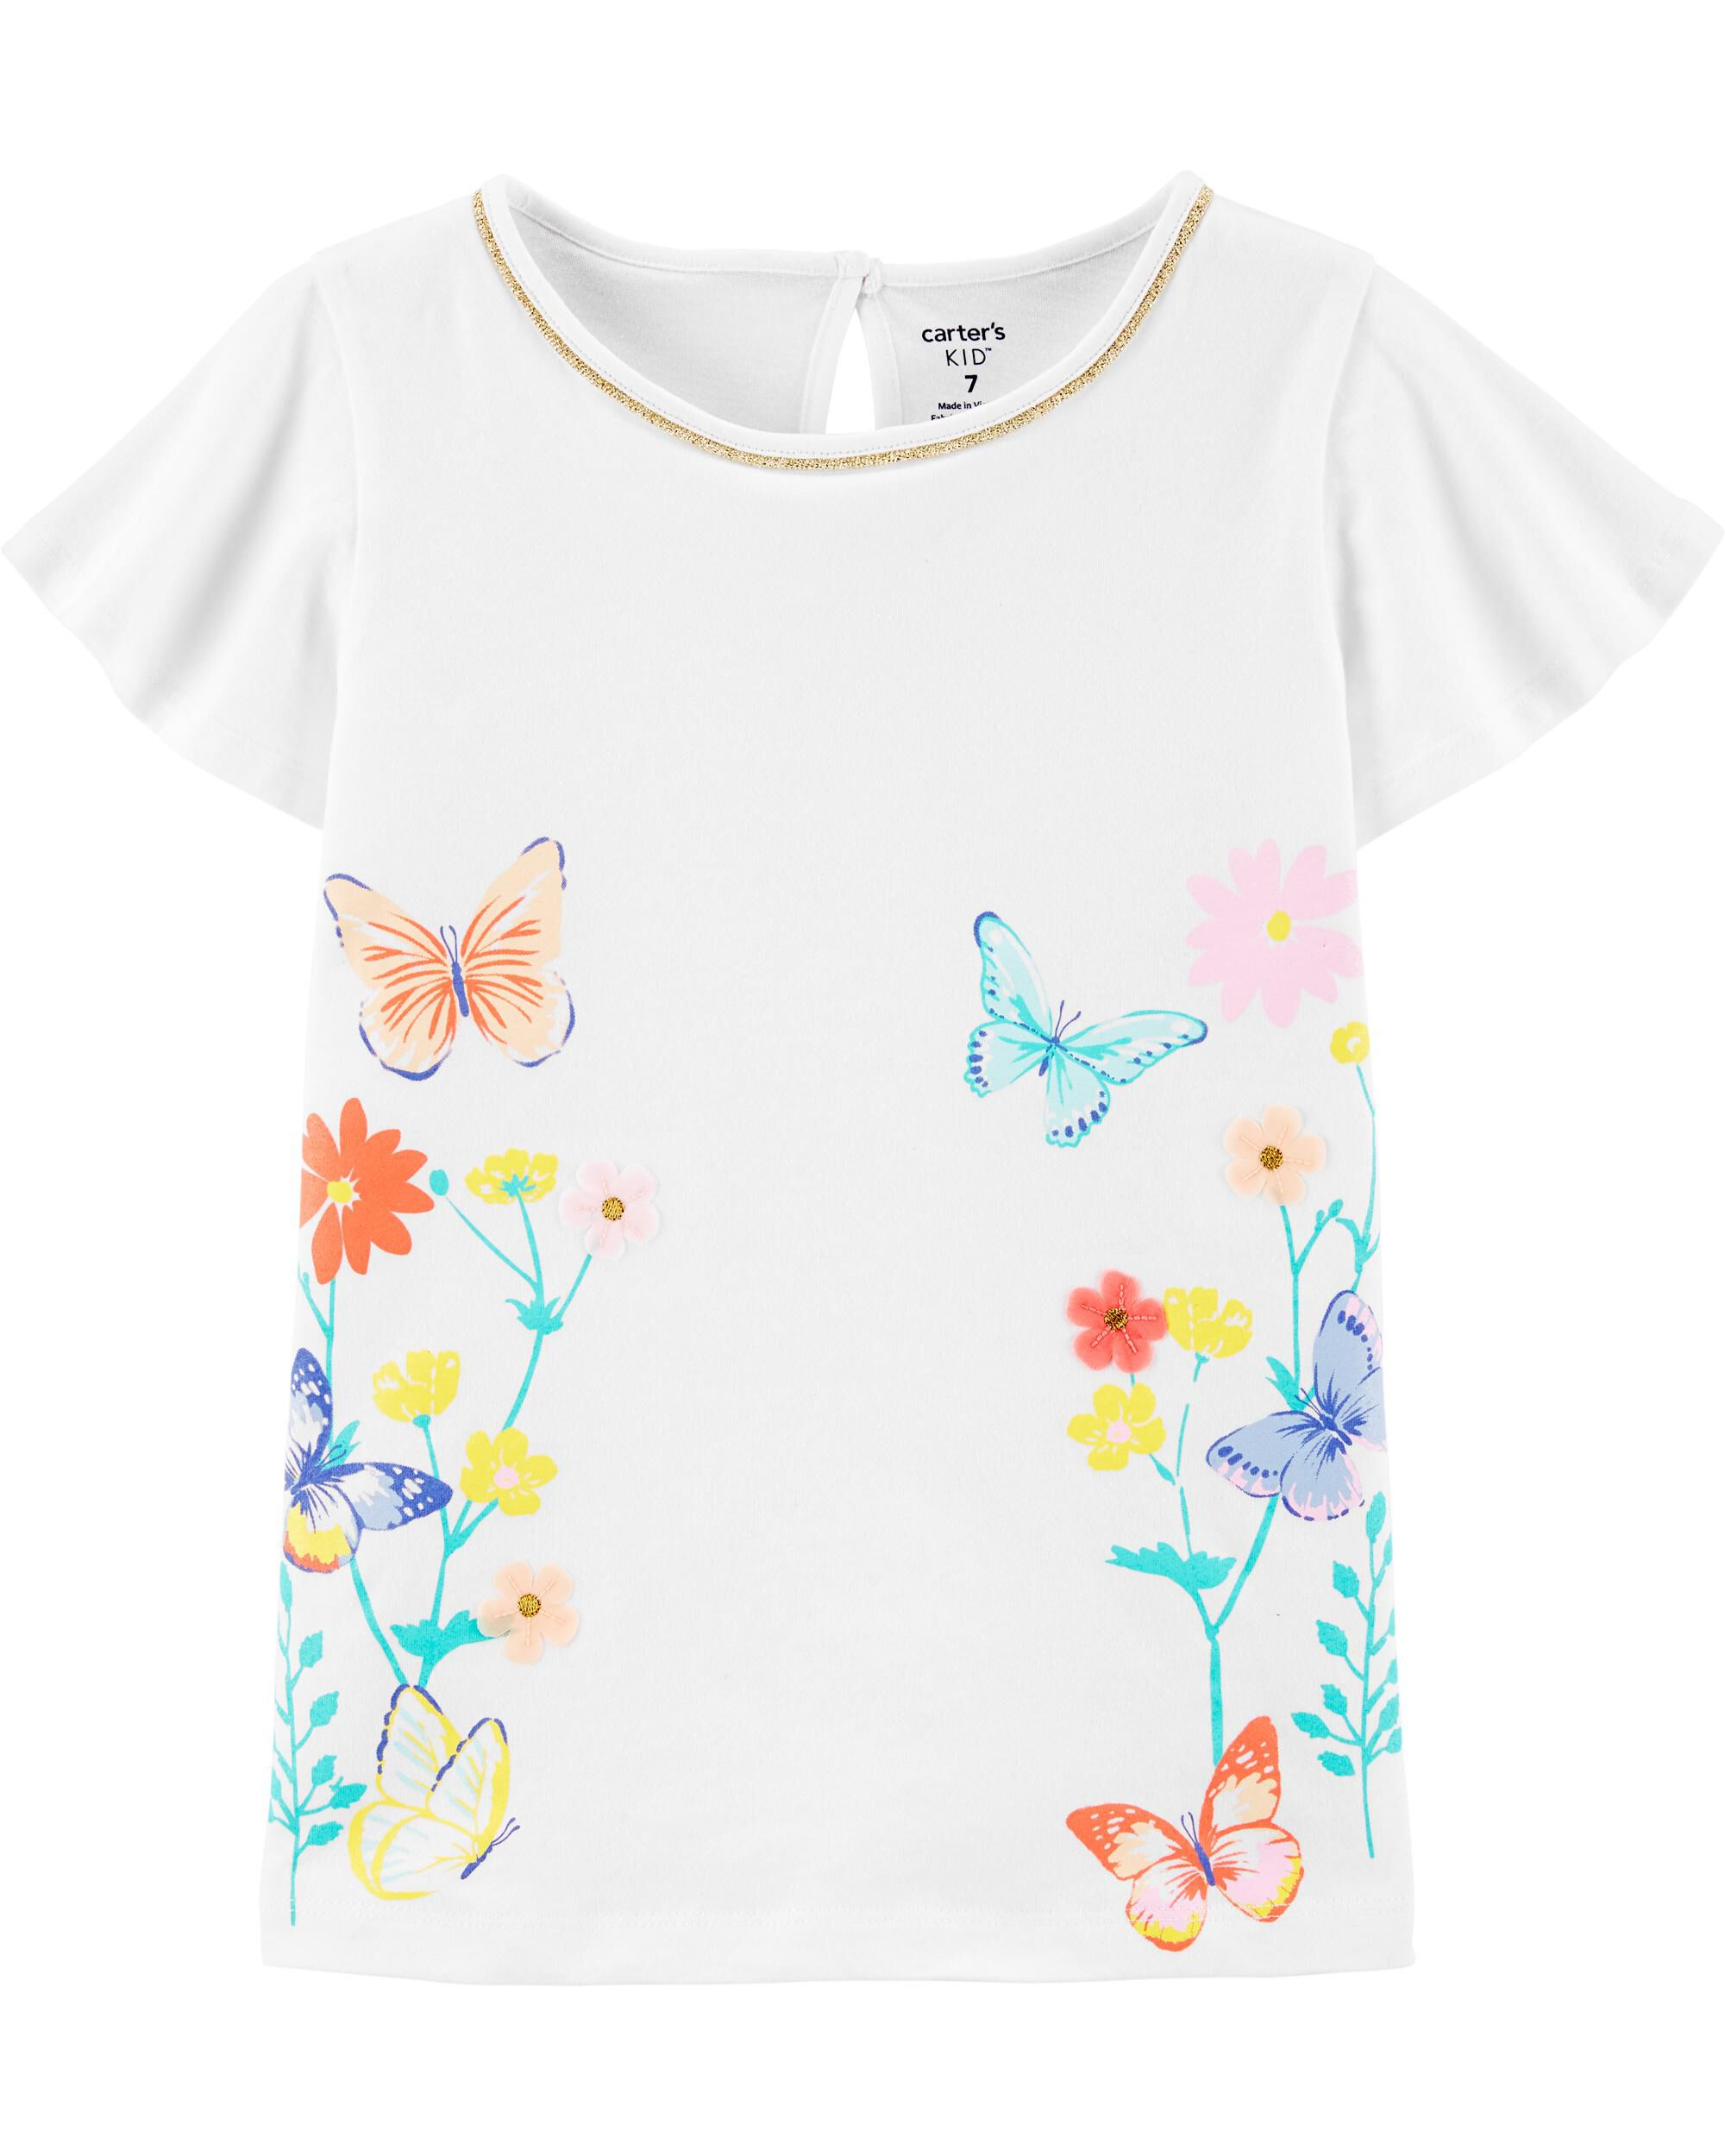 *DOORBUSTER* Floral Butterfly Tulip Jersey Tee